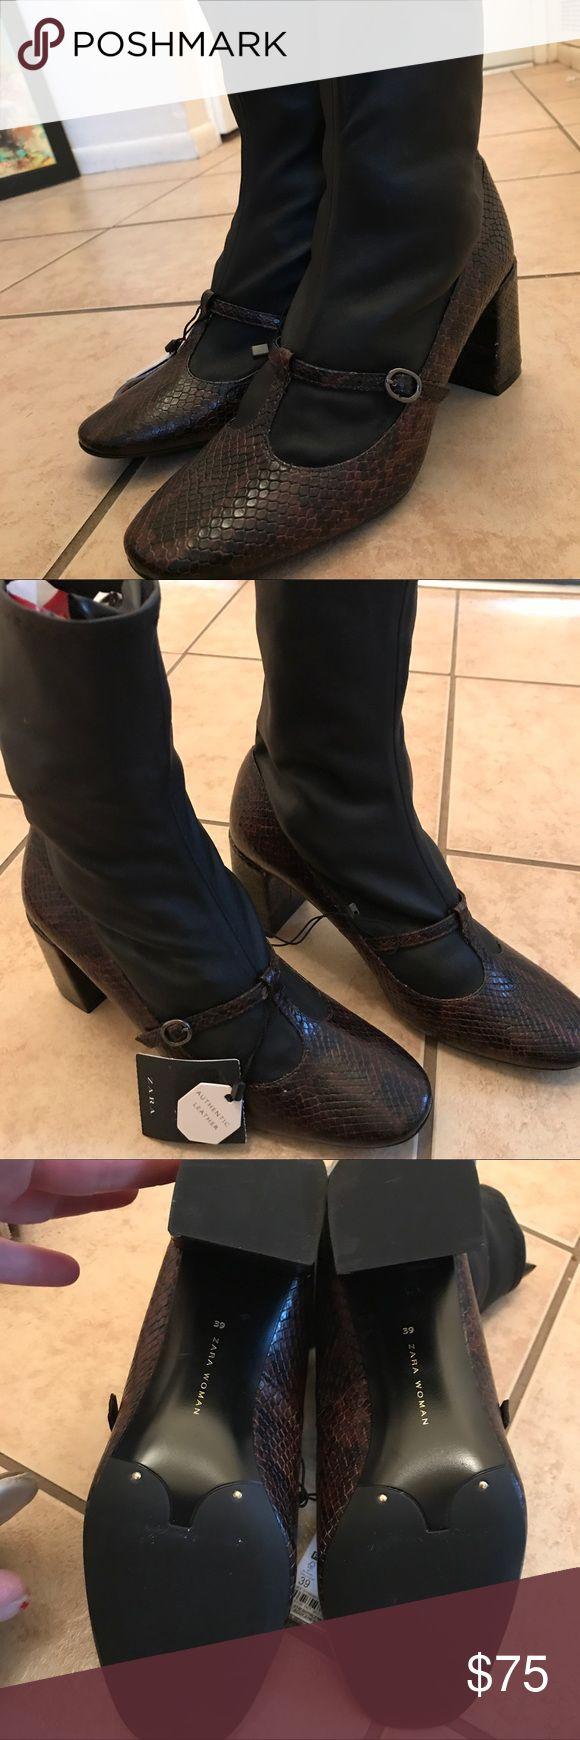 Zara Boots Authentic Leather SZ 8 NWT Zara Boots Authentic Leather SZ 8 NWT Zara Shoes Ankle Boots & Booties